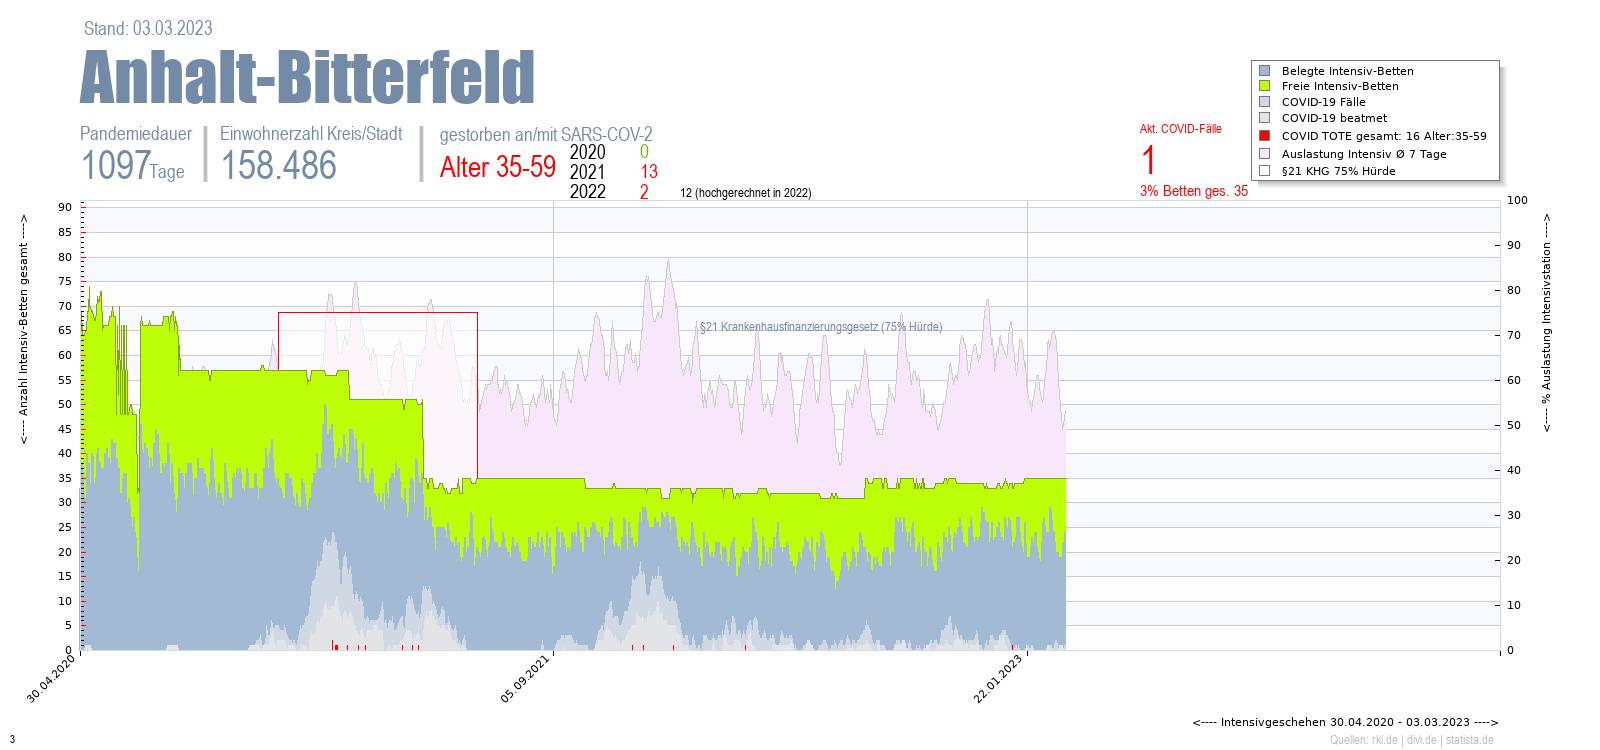 Intensivstation Auslastung Anhalt-Bitterfeld Alter 0-4